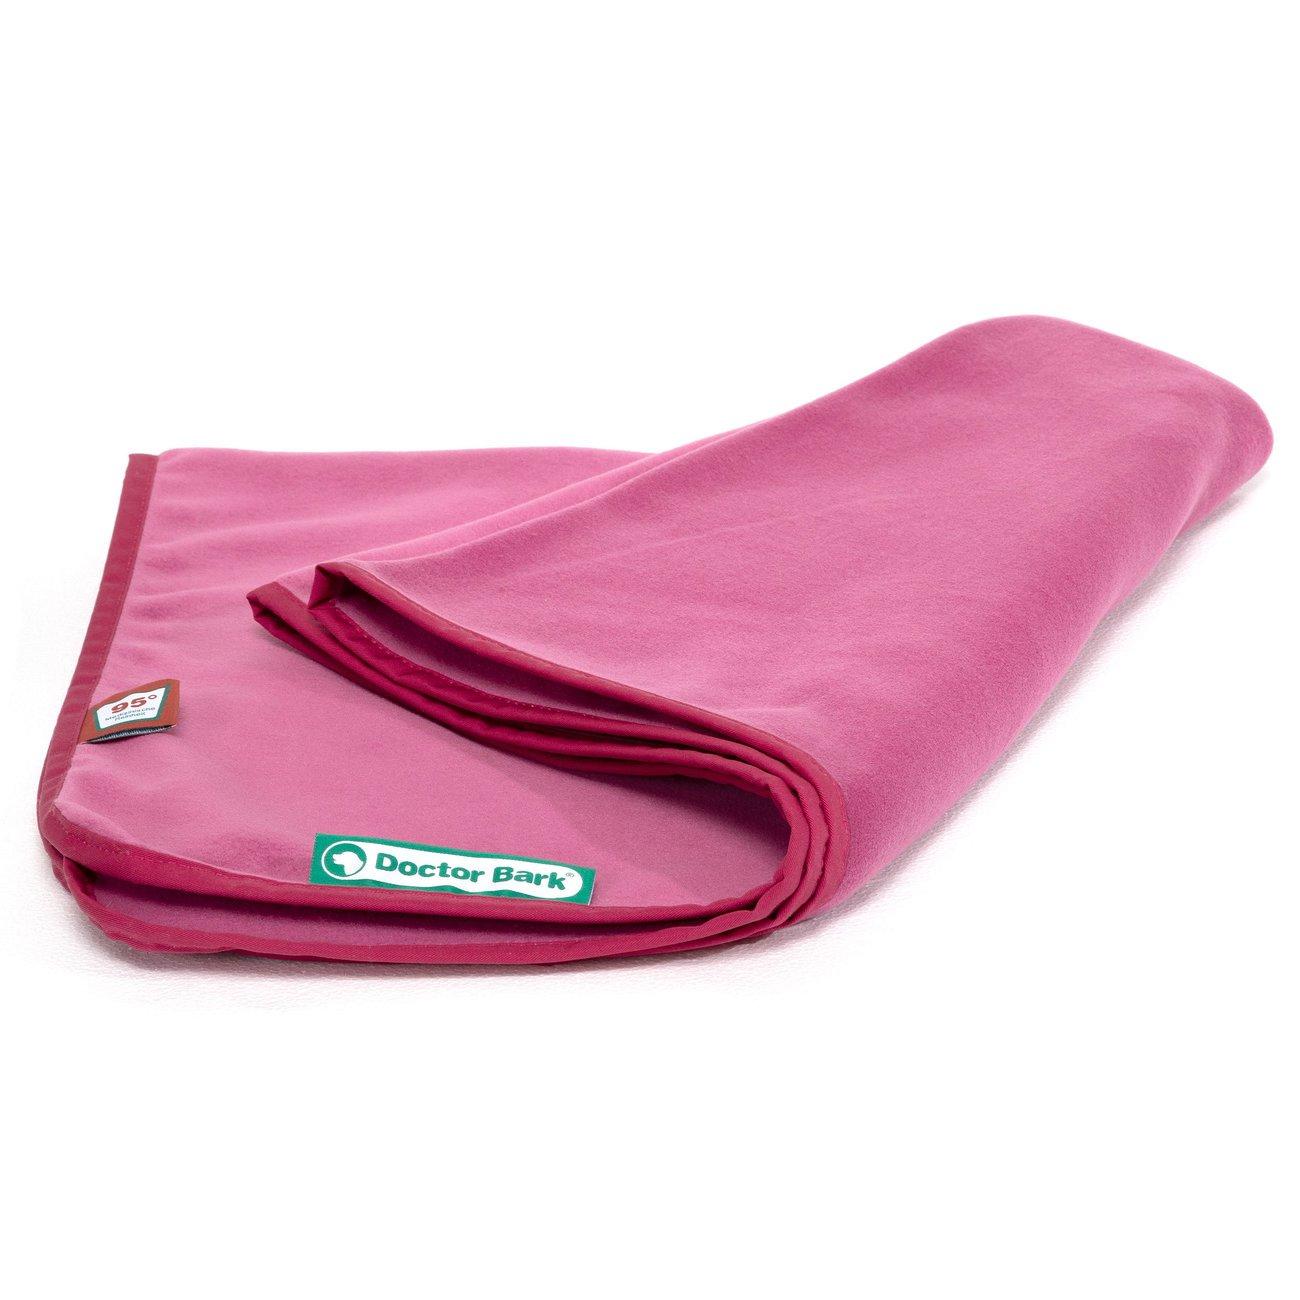 Doctor Bark Kuscheldecke Fleece für Hunde, Gr. M -hot pink - ca. 100x70cm